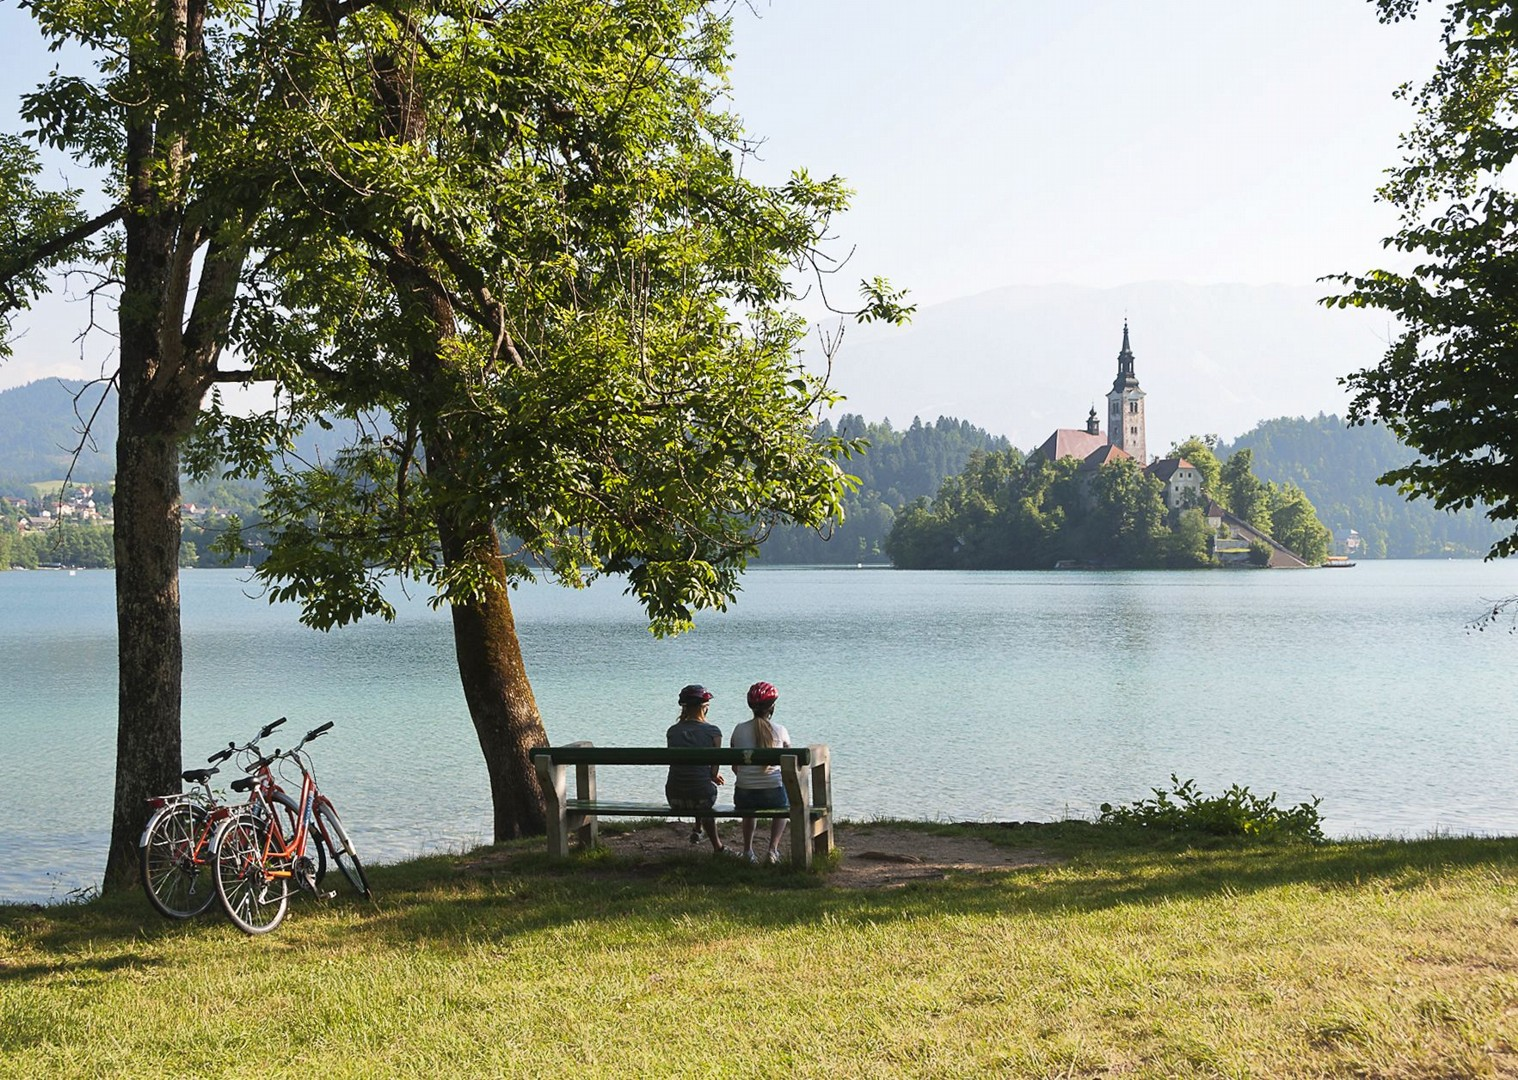 pokljuka-slovenia-magical-lake-bled-self-guided-family-cycling-holiday.jpg - Slovenia - Magical Lake Bled - Self-Guided Family Cycling Holiday - Family Cycling